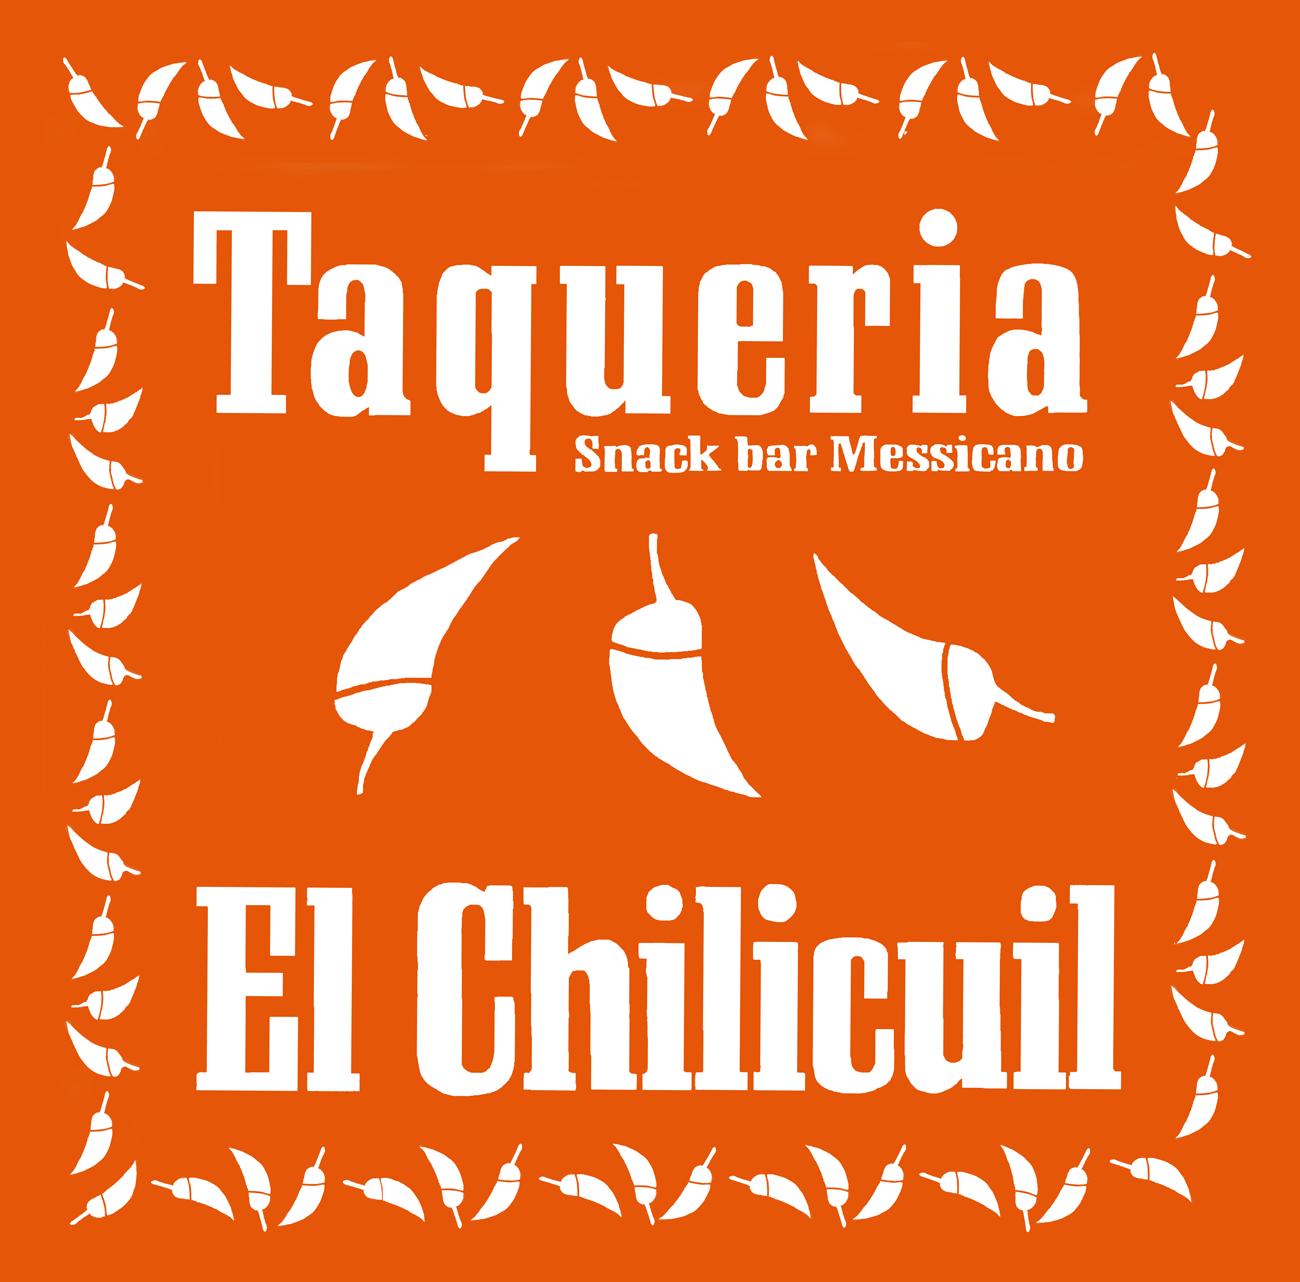 Taqueria el Chilicuil